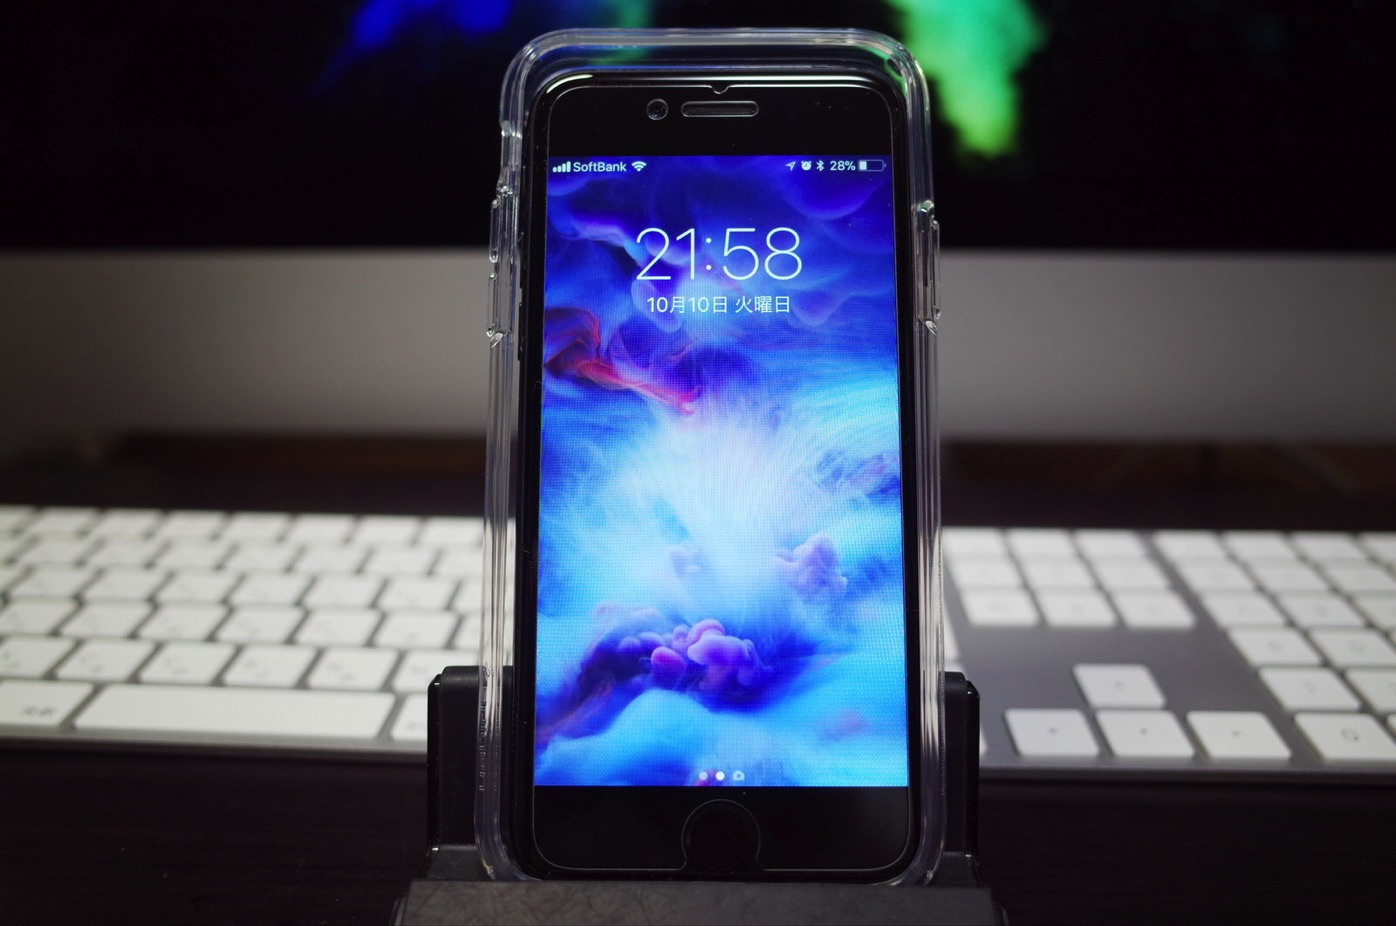 【Spigen】iPhone X ケース, [ 米軍MIL規格取得 落下 衝撃 吸収 ] ウルトラ・ハイブリッド アイフォン X 用 耐衝撃 カバー^13